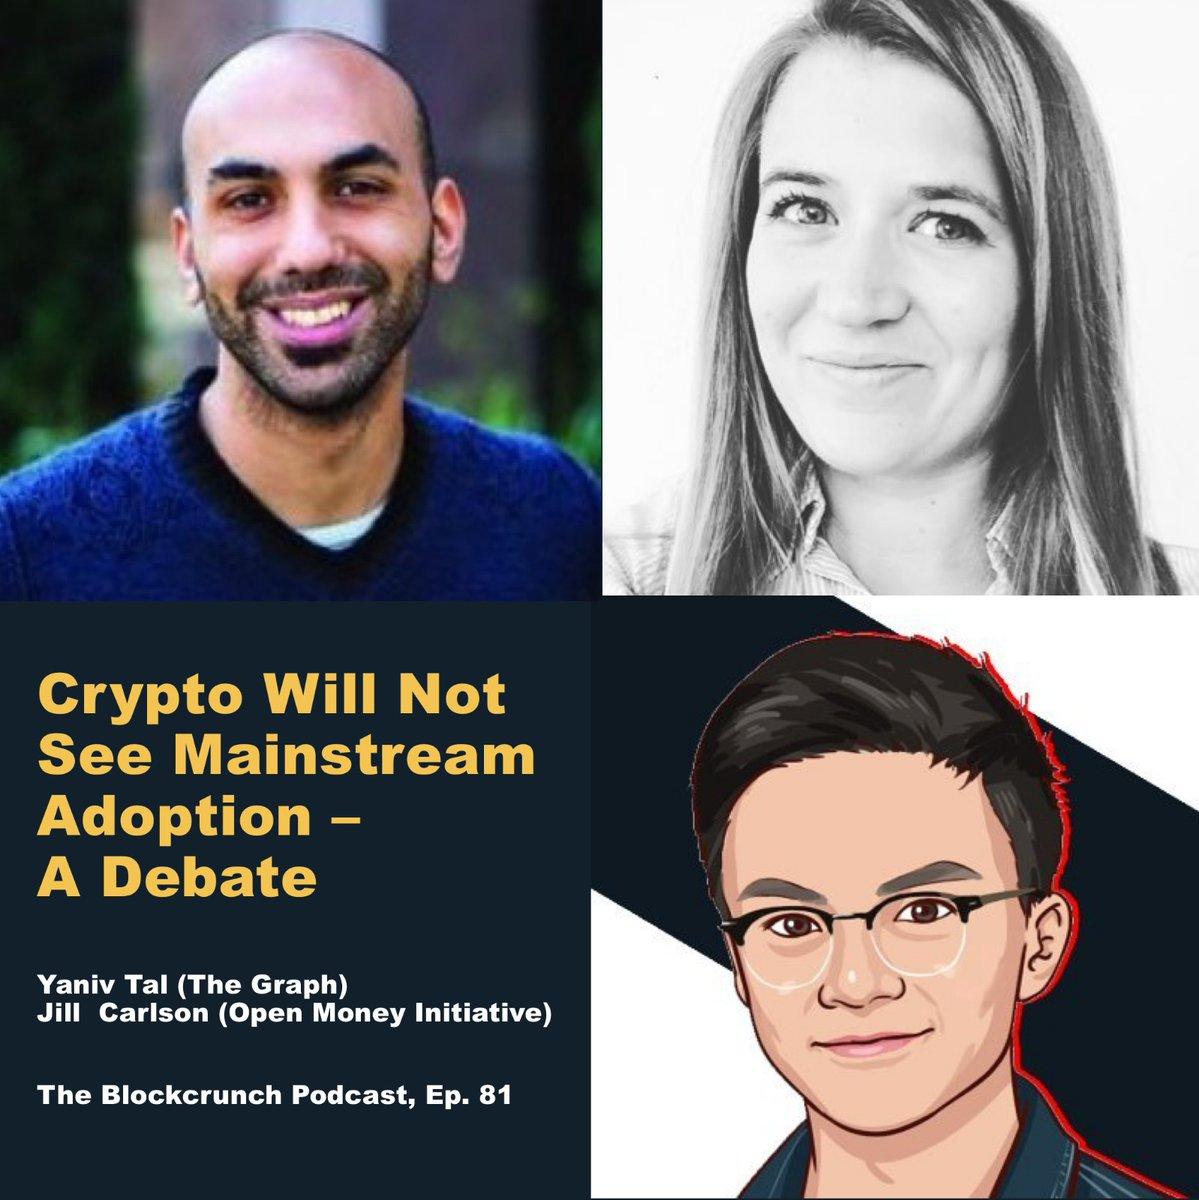 Yaniv Tal and Jill Carlson Debate on Blockcrunch